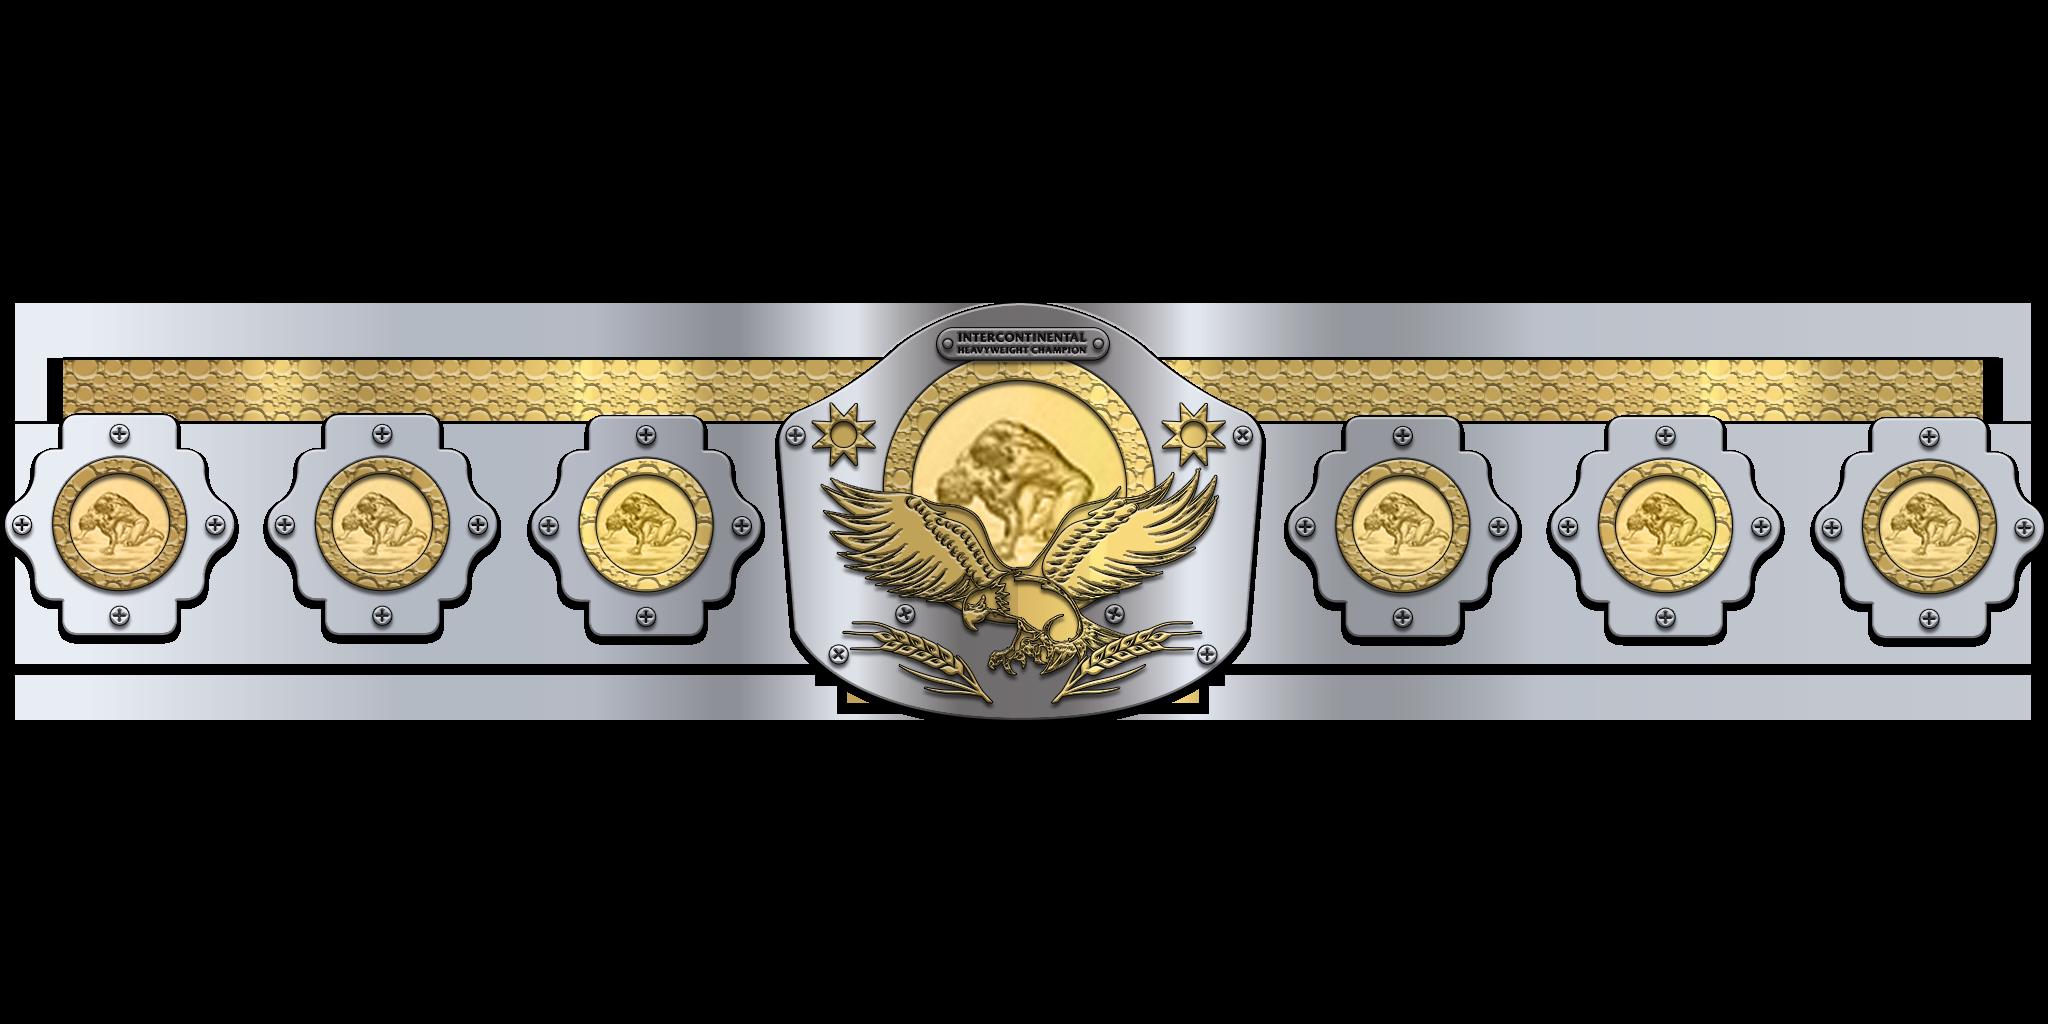 Https I Imgur Com De6hro1 Png Wwe Intercontinental Championship Nwa Wrestling Wwf